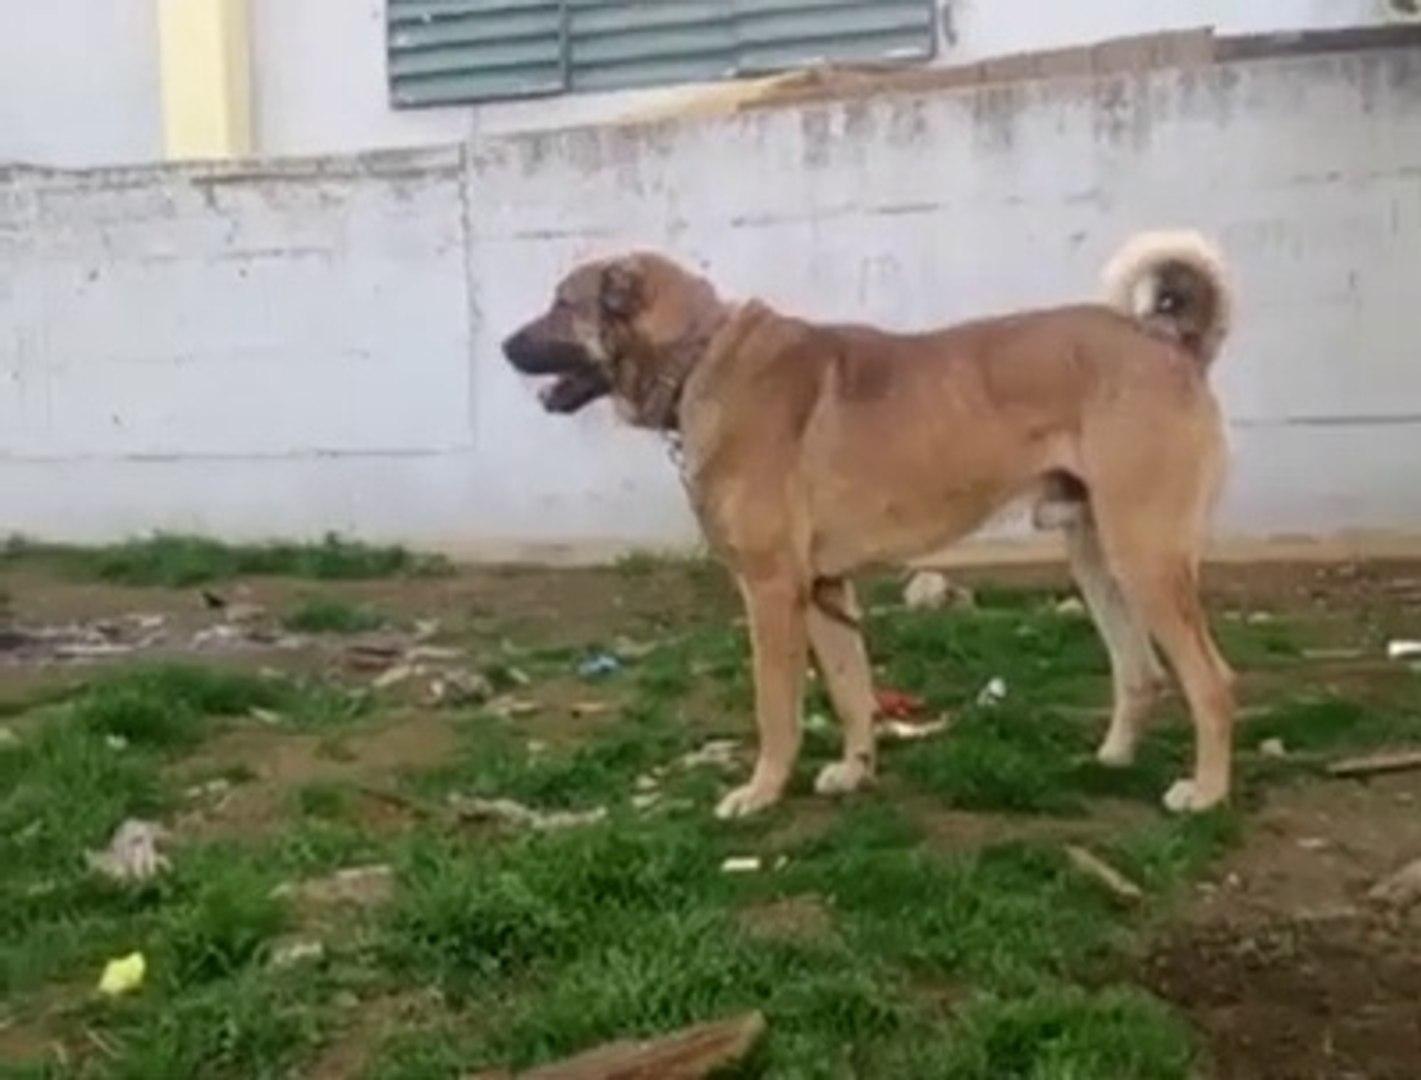 FULL SiMiT KUYRUK ANADOLU COBAN KOPEGi - ANATOLiAN SHEPHERD DOG